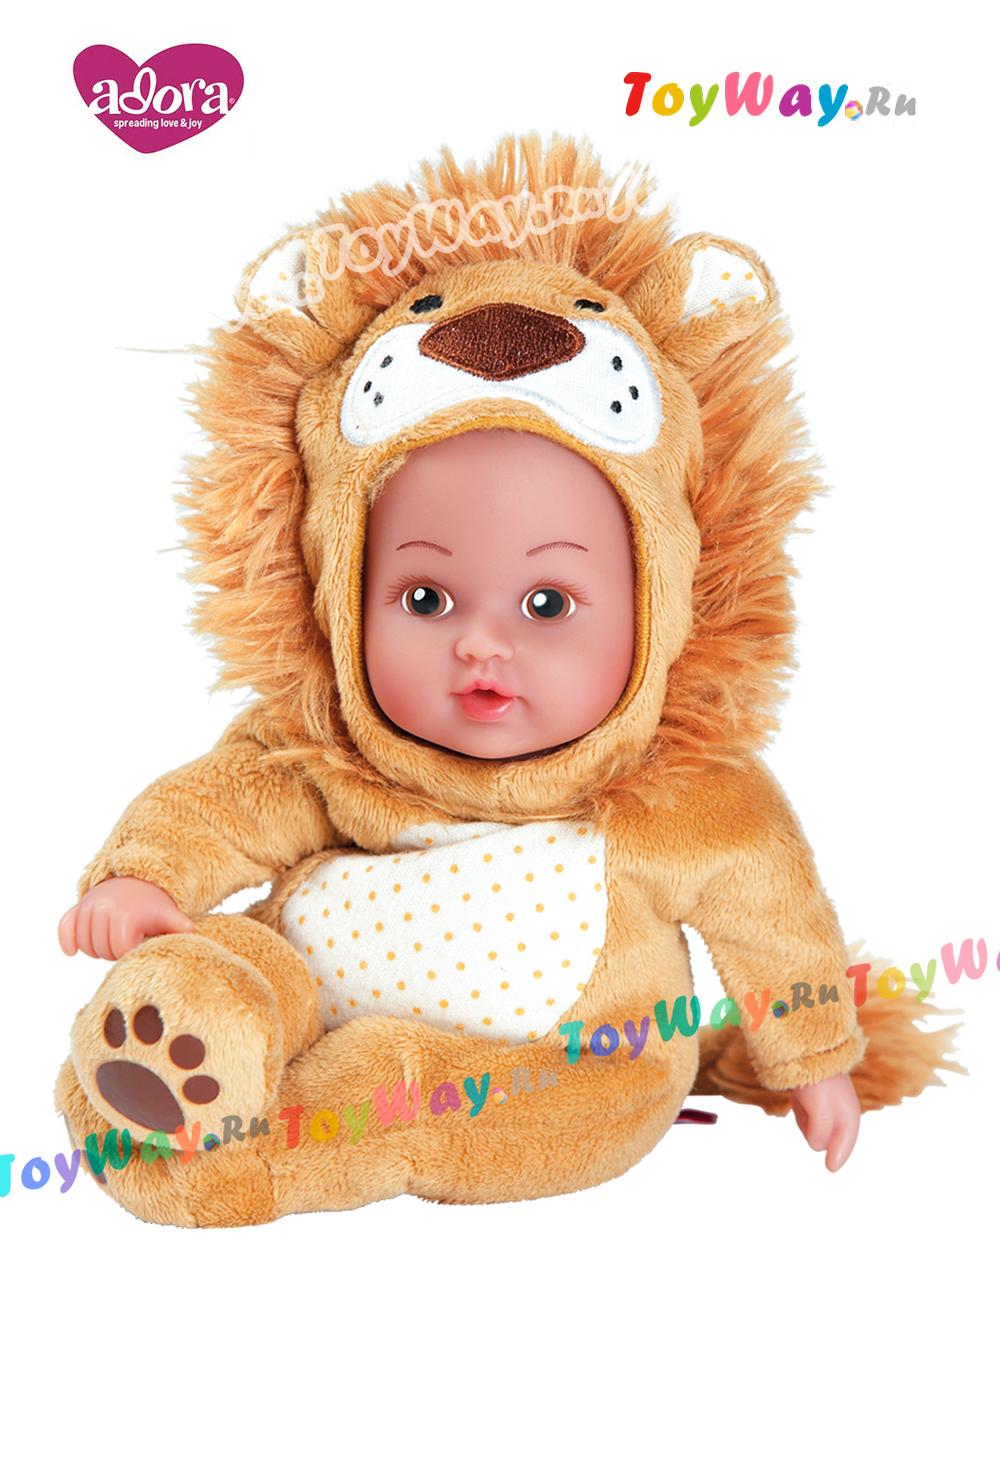 Кукла - Лев, 20 смКуклы Адора<br>Кукла - Лев, 20 см<br>